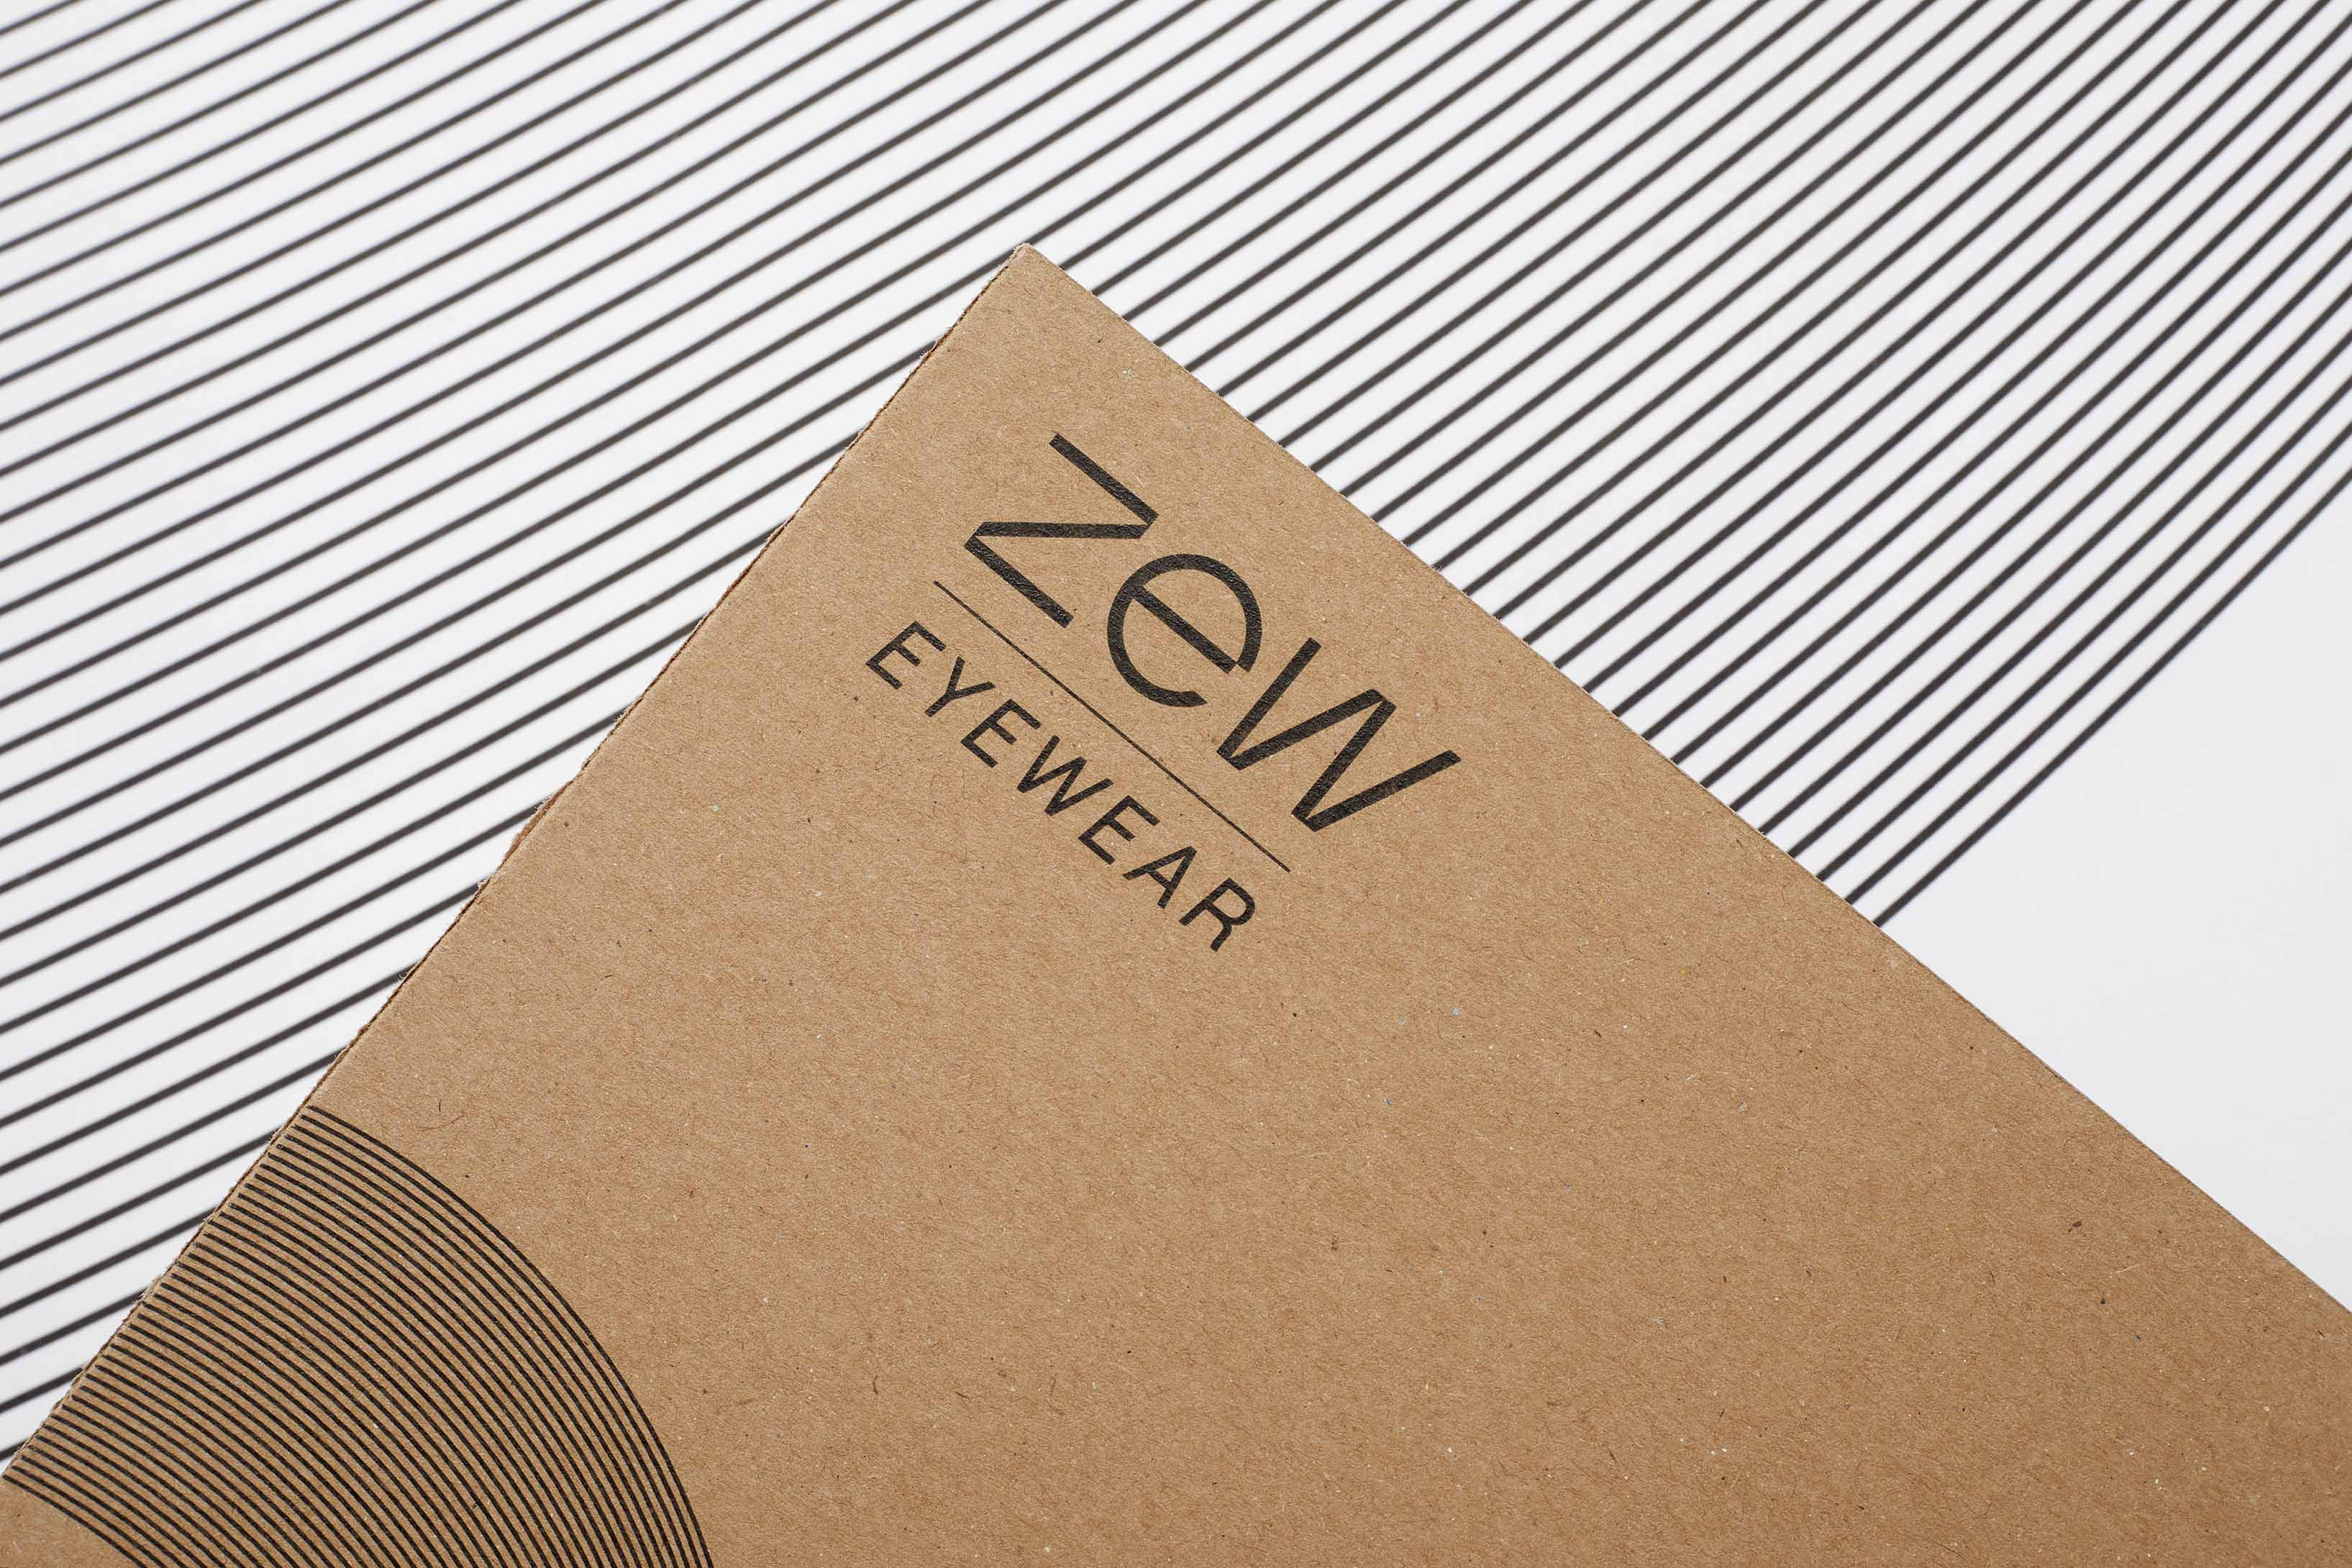 ZEW_Veronika_Rut_Novakova_Design_05